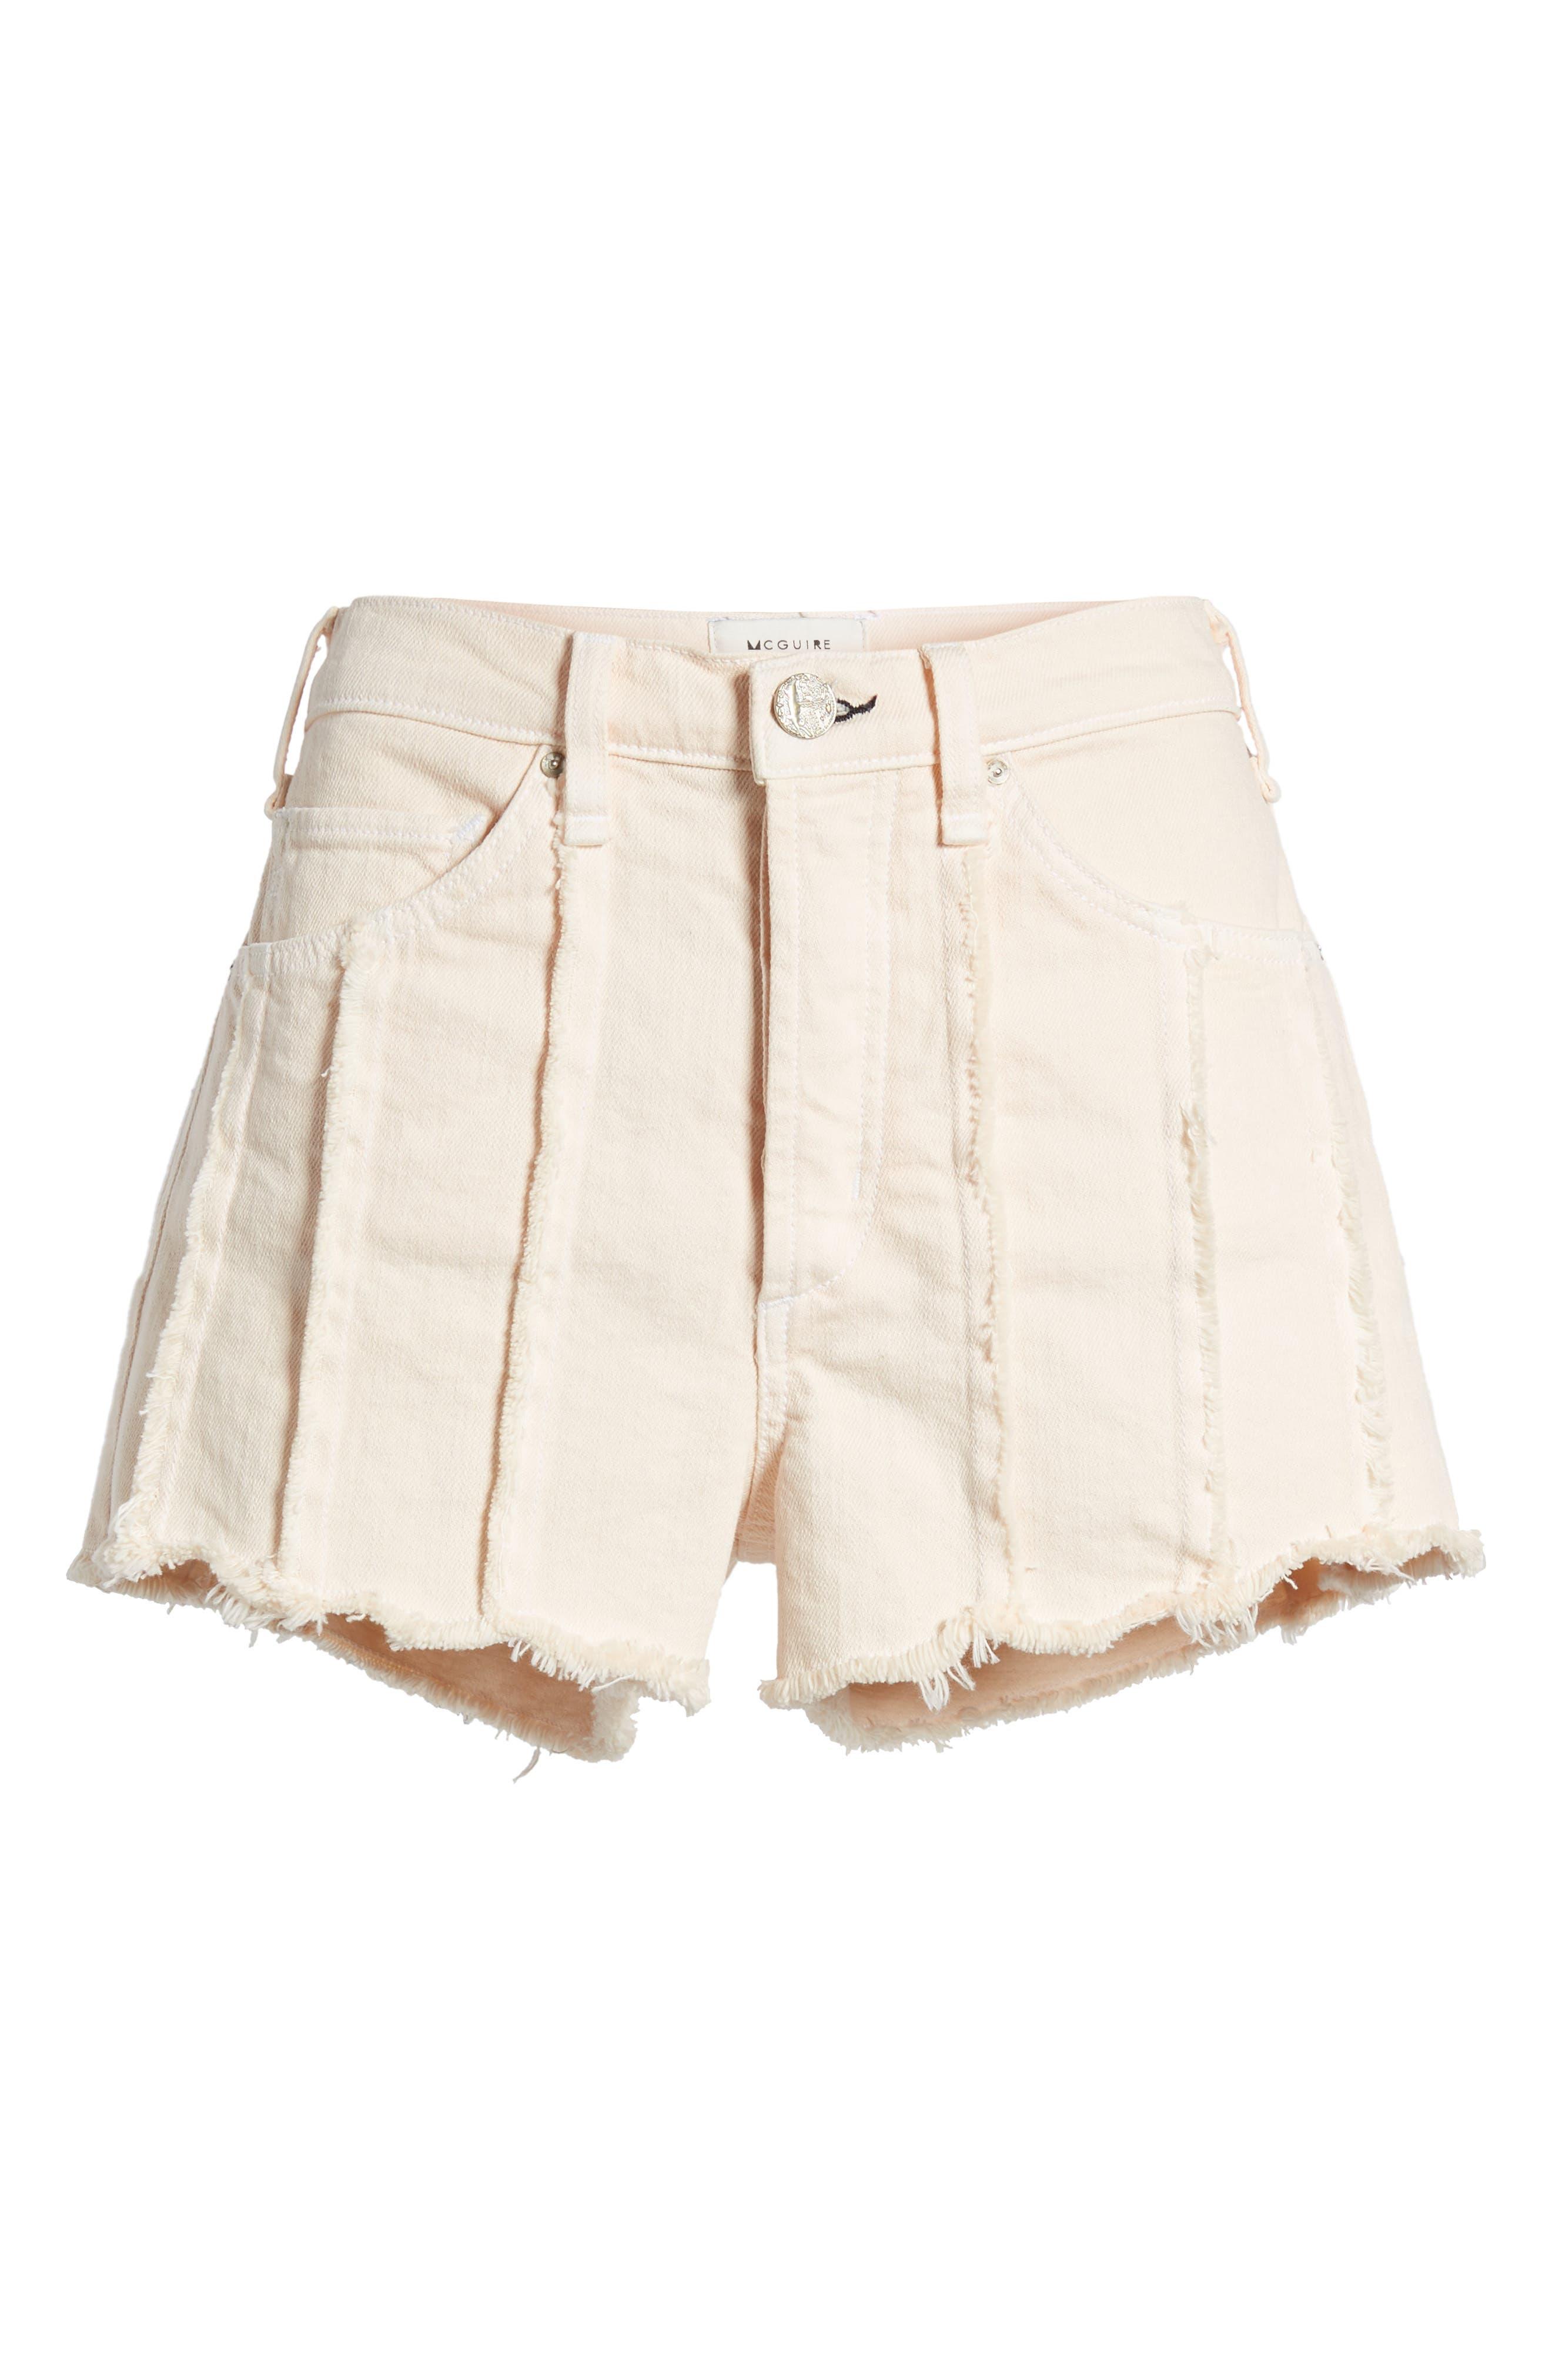 Georgia May High Waist Shorts,                             Alternate thumbnail 7, color,                             650